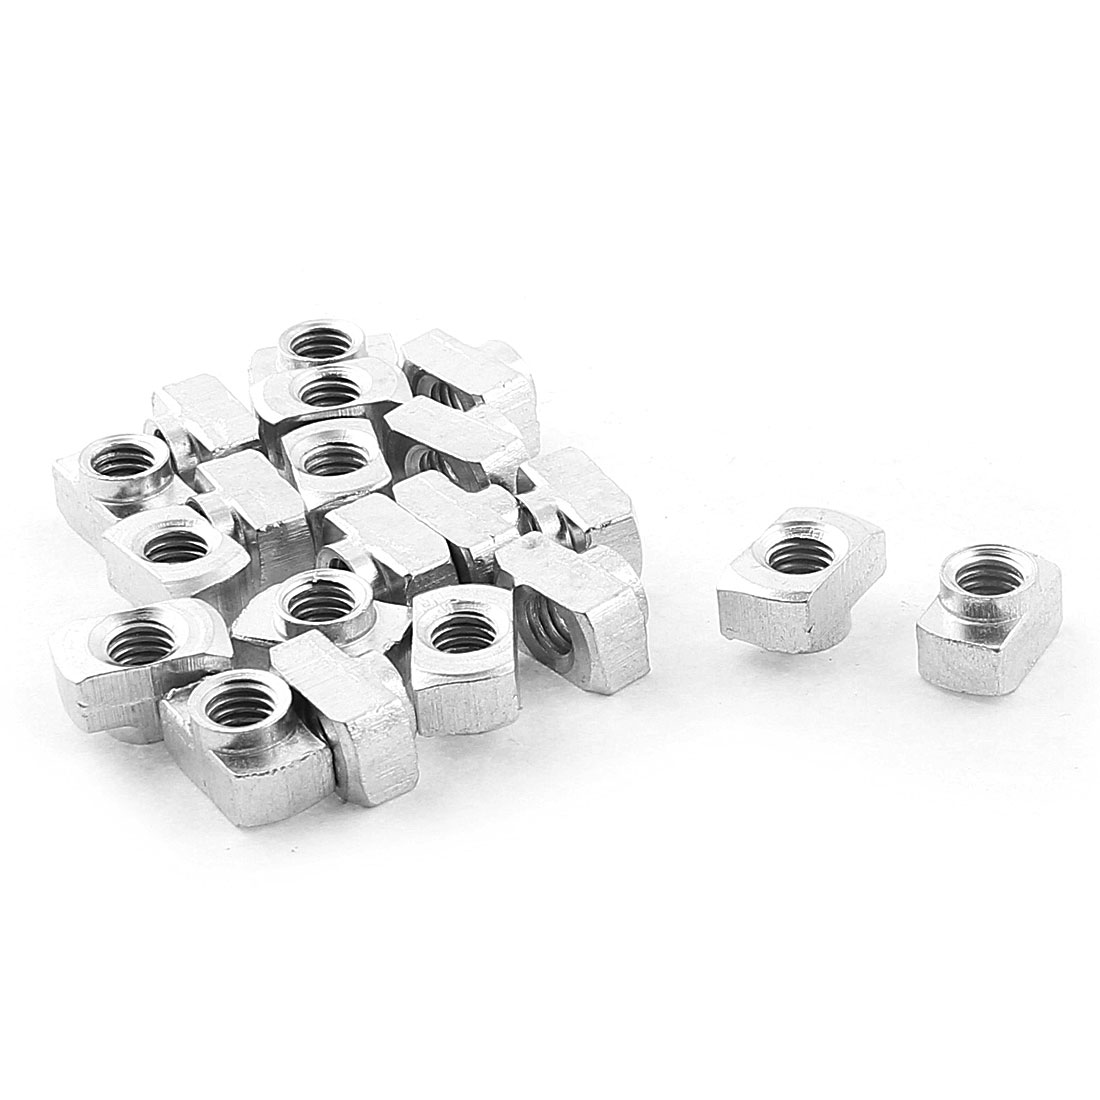 M6 Female Thread 40 Series T Slot Hammer Head Drop-in Nut Silver Tone 20pcs